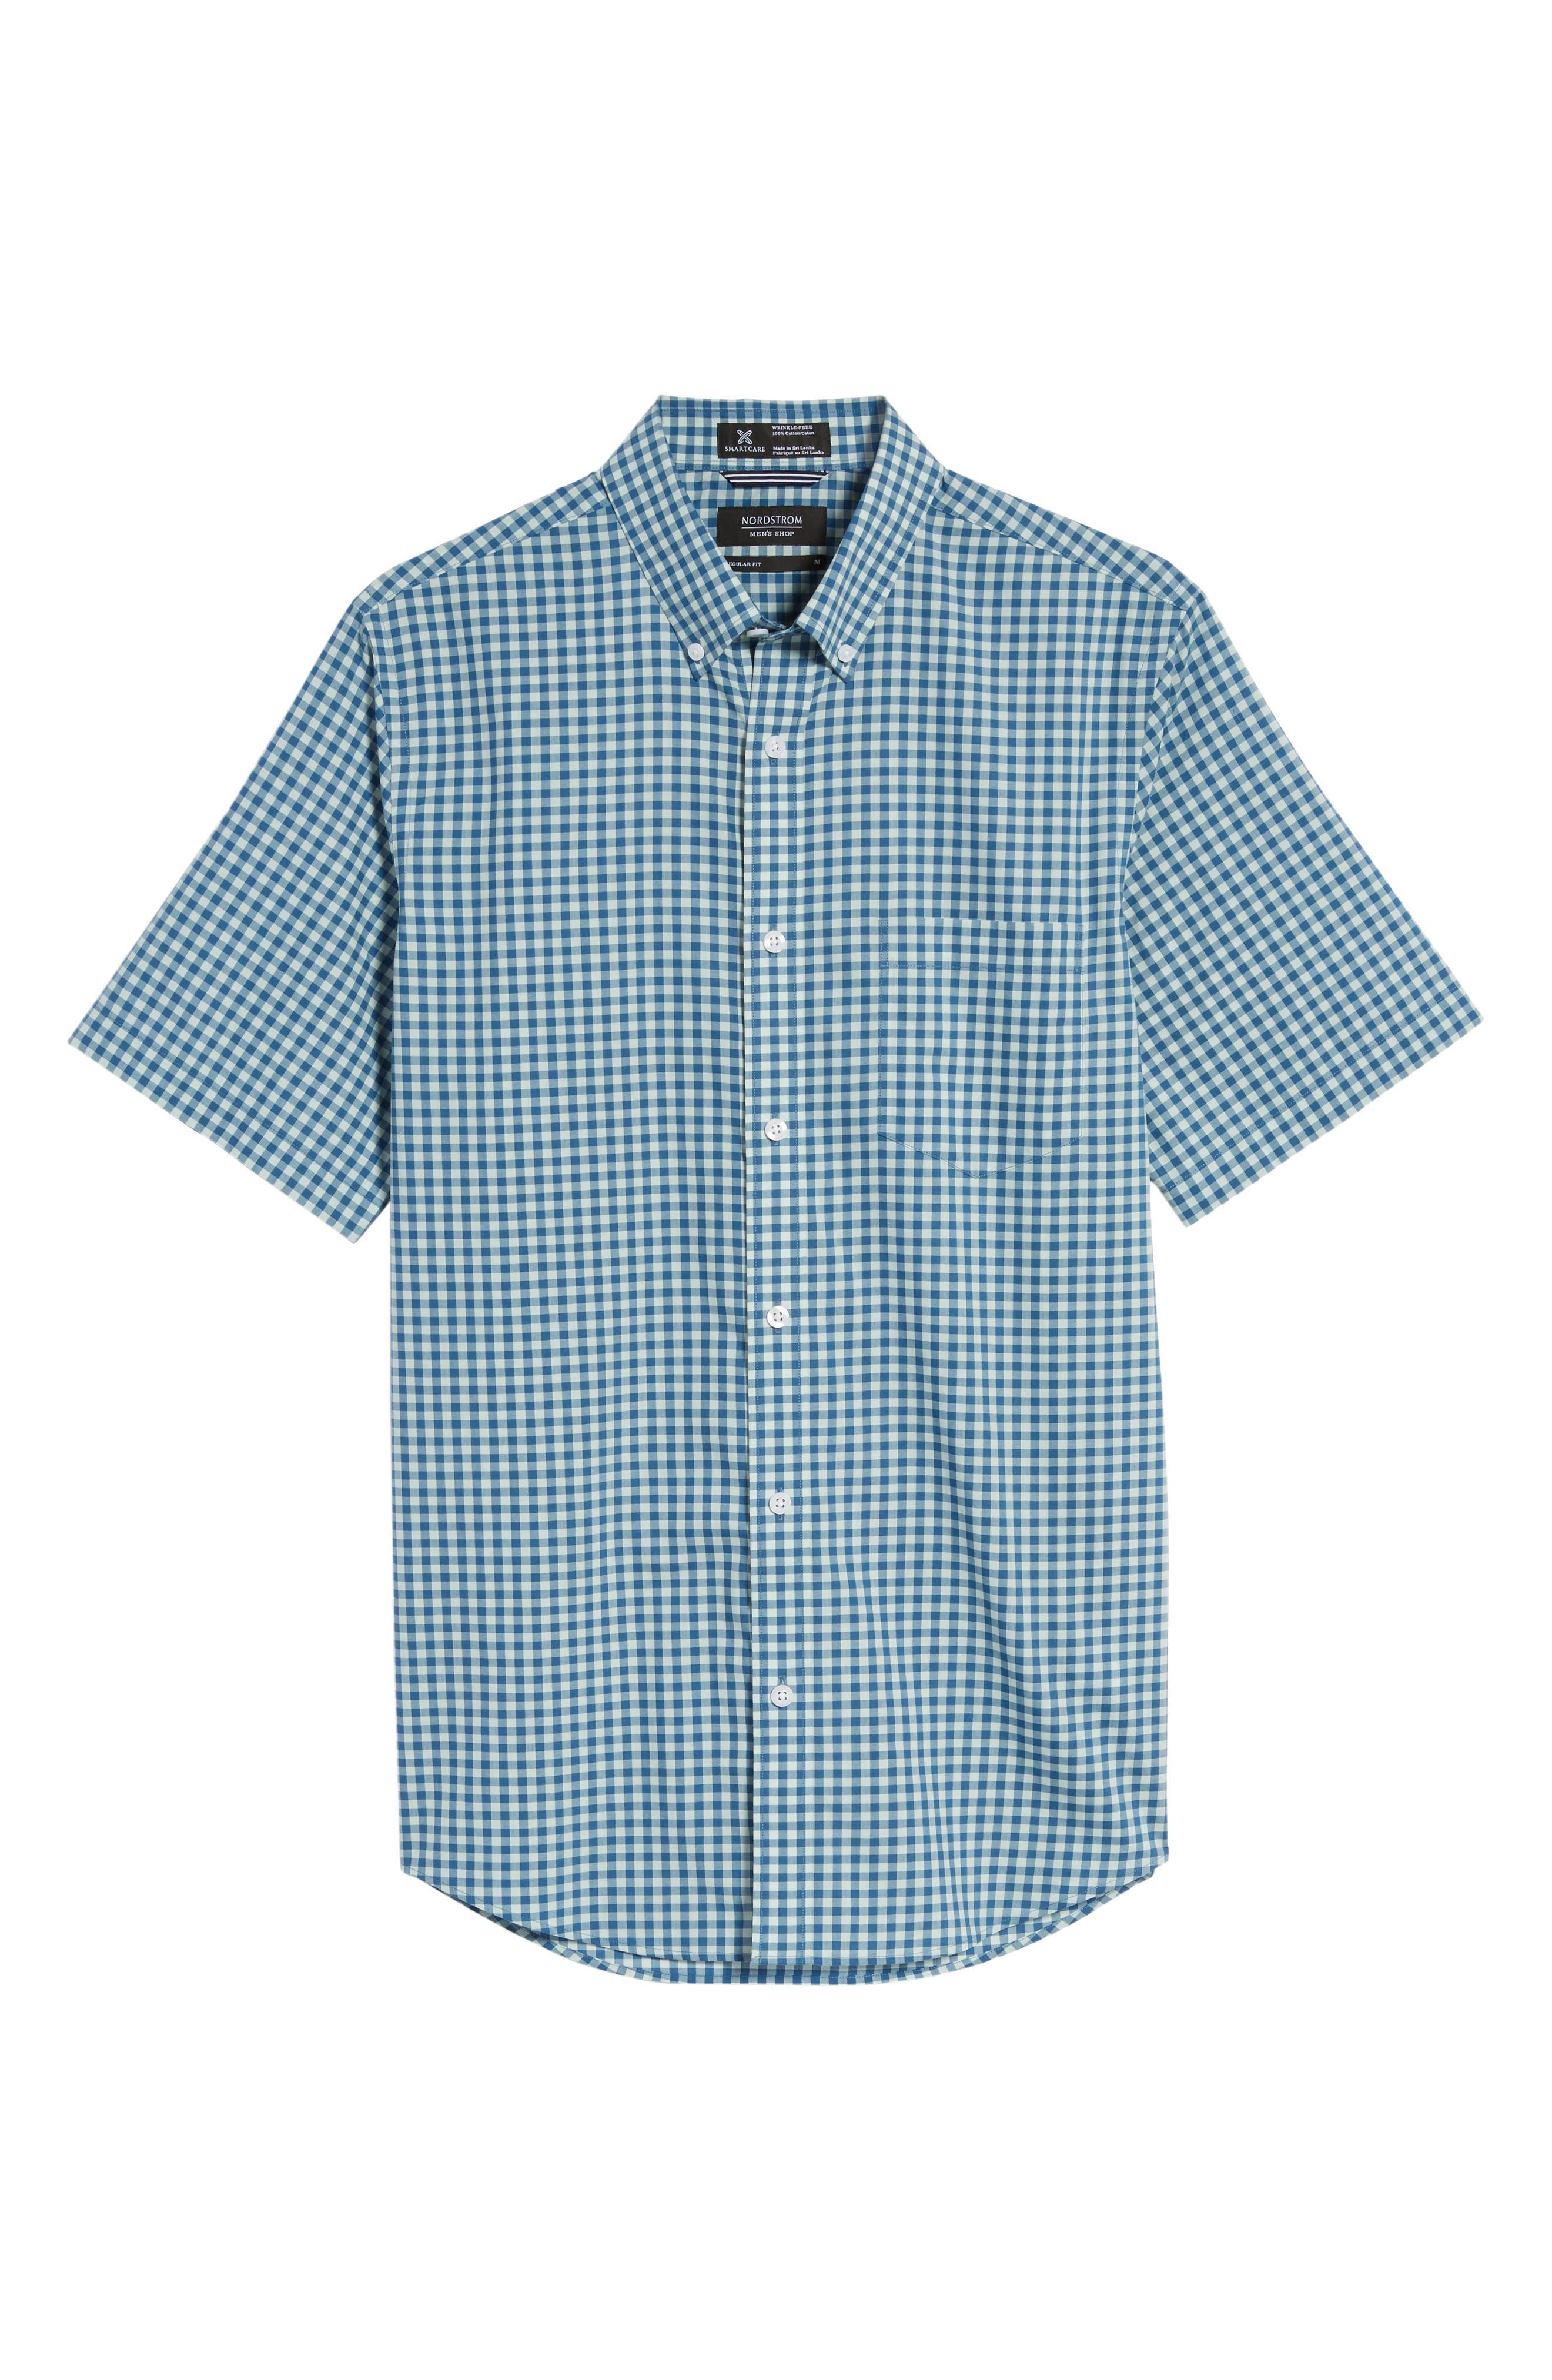 Regular Fit Gingham Sport Shirt,                             Alternate thumbnail 6, color,                             Teal Surf Blue Gingham